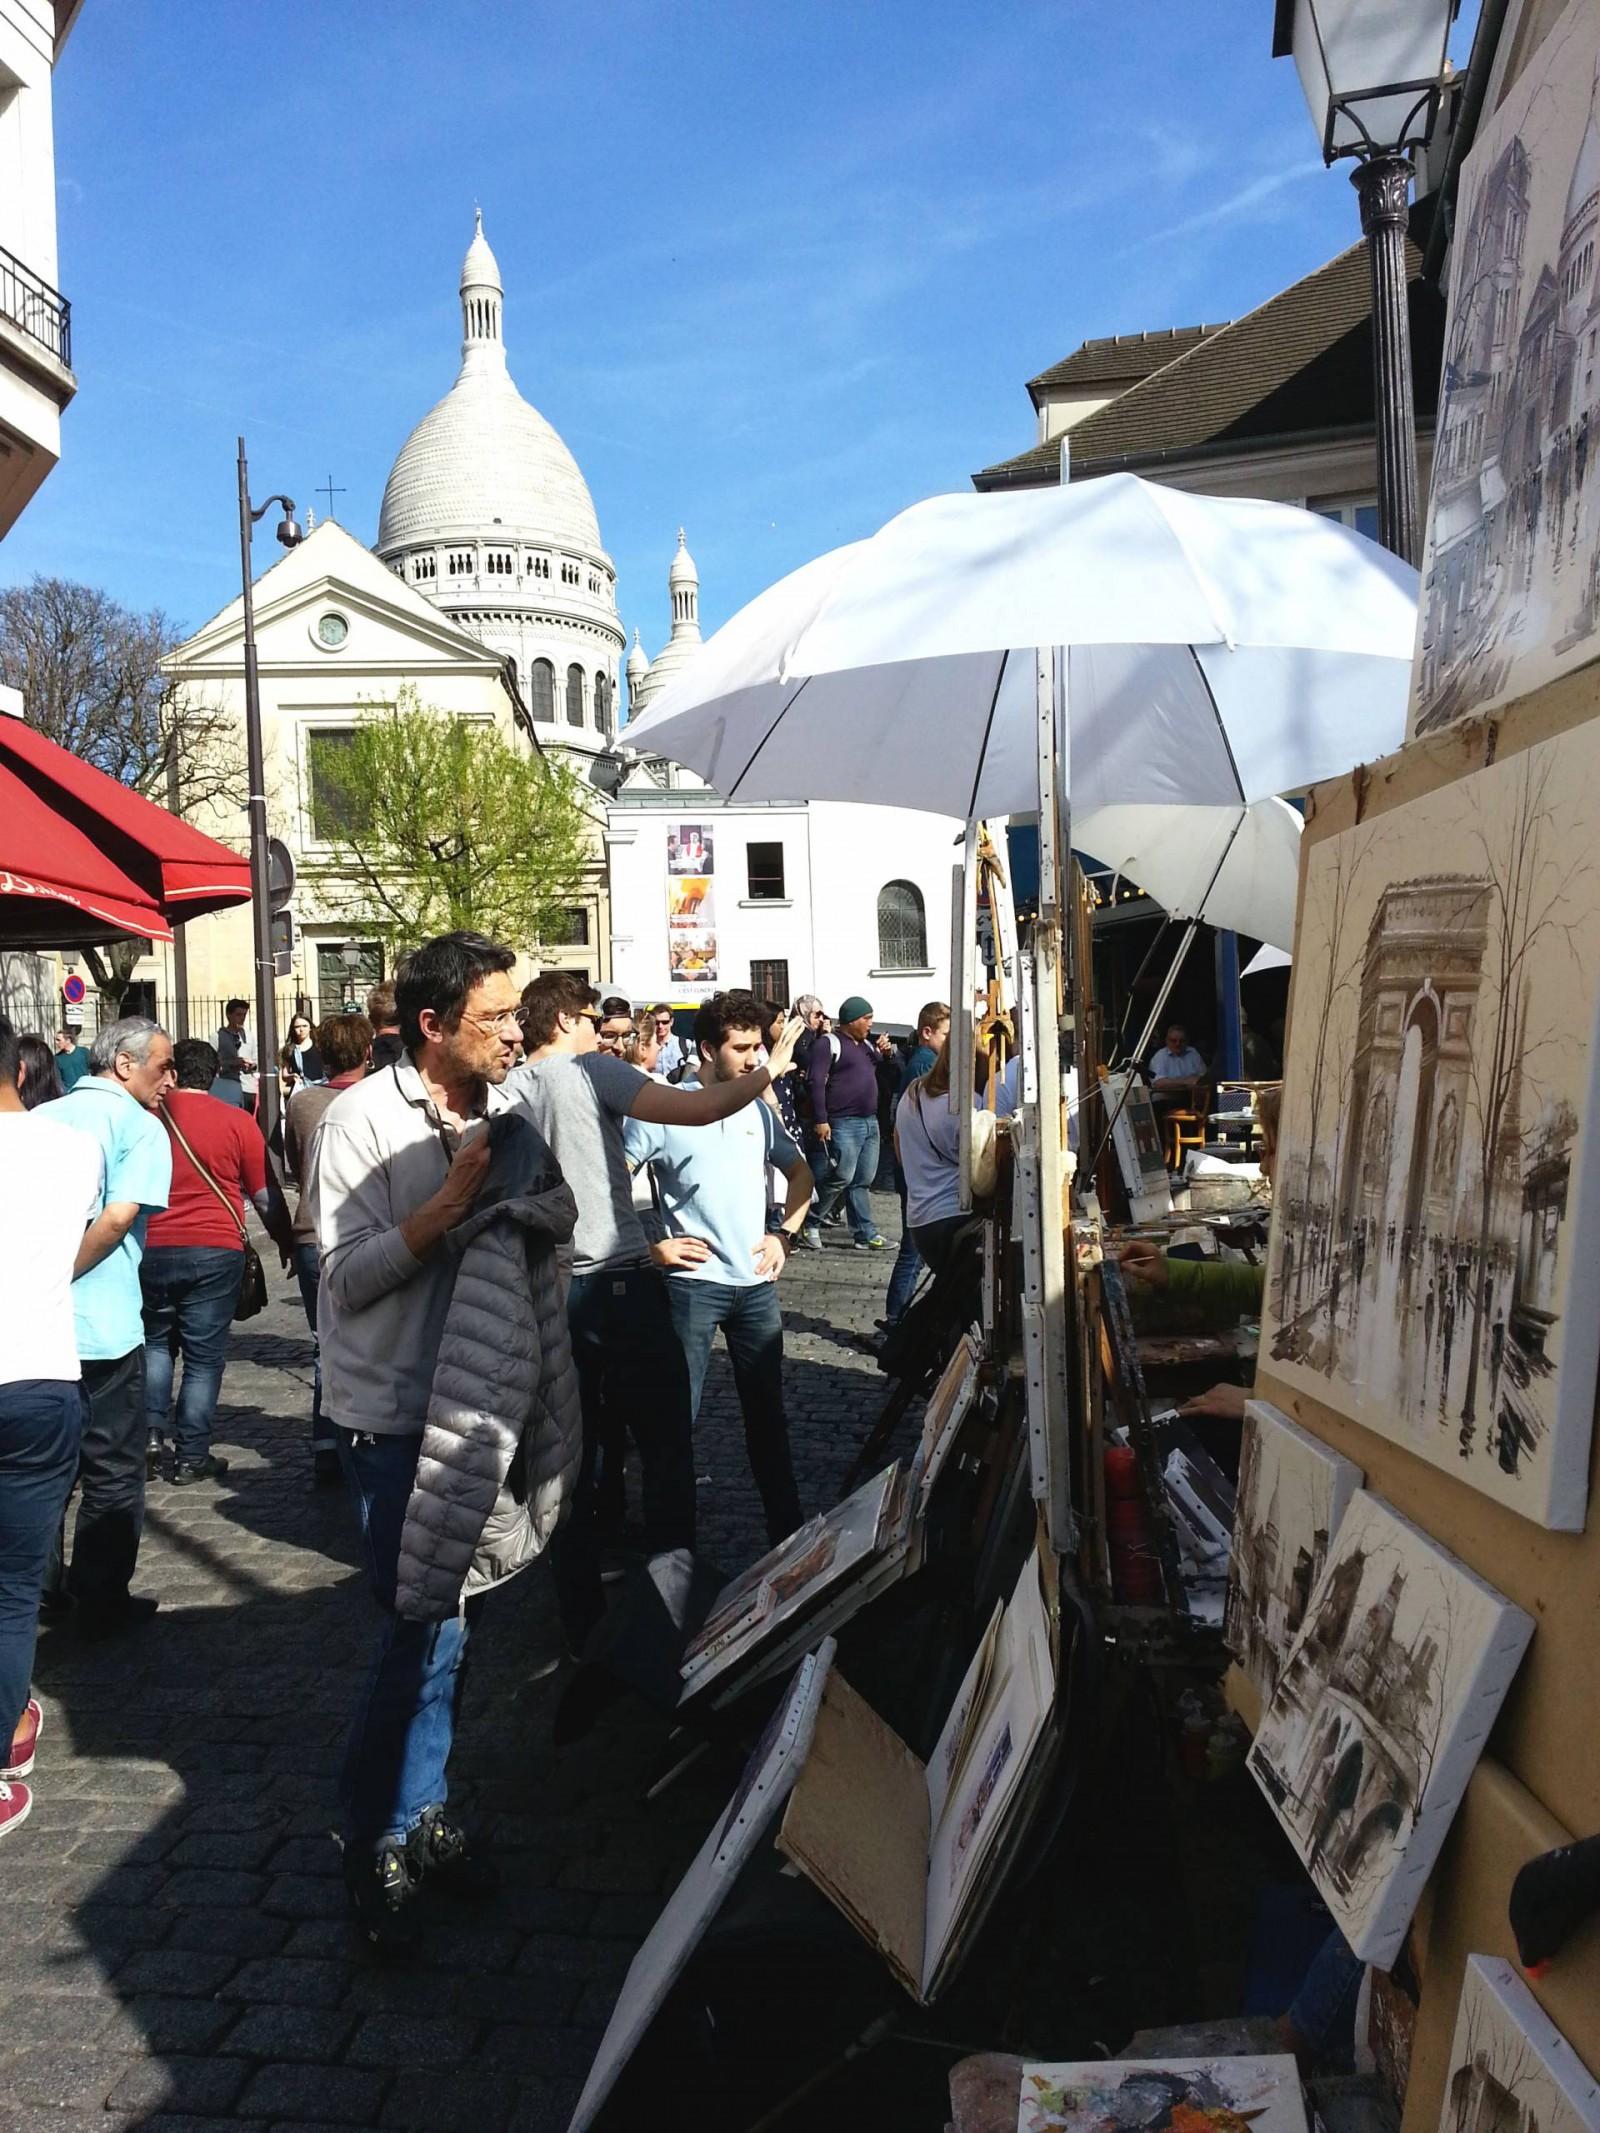 Paris: Seine Cruise and Montmartre, Montmartre artists